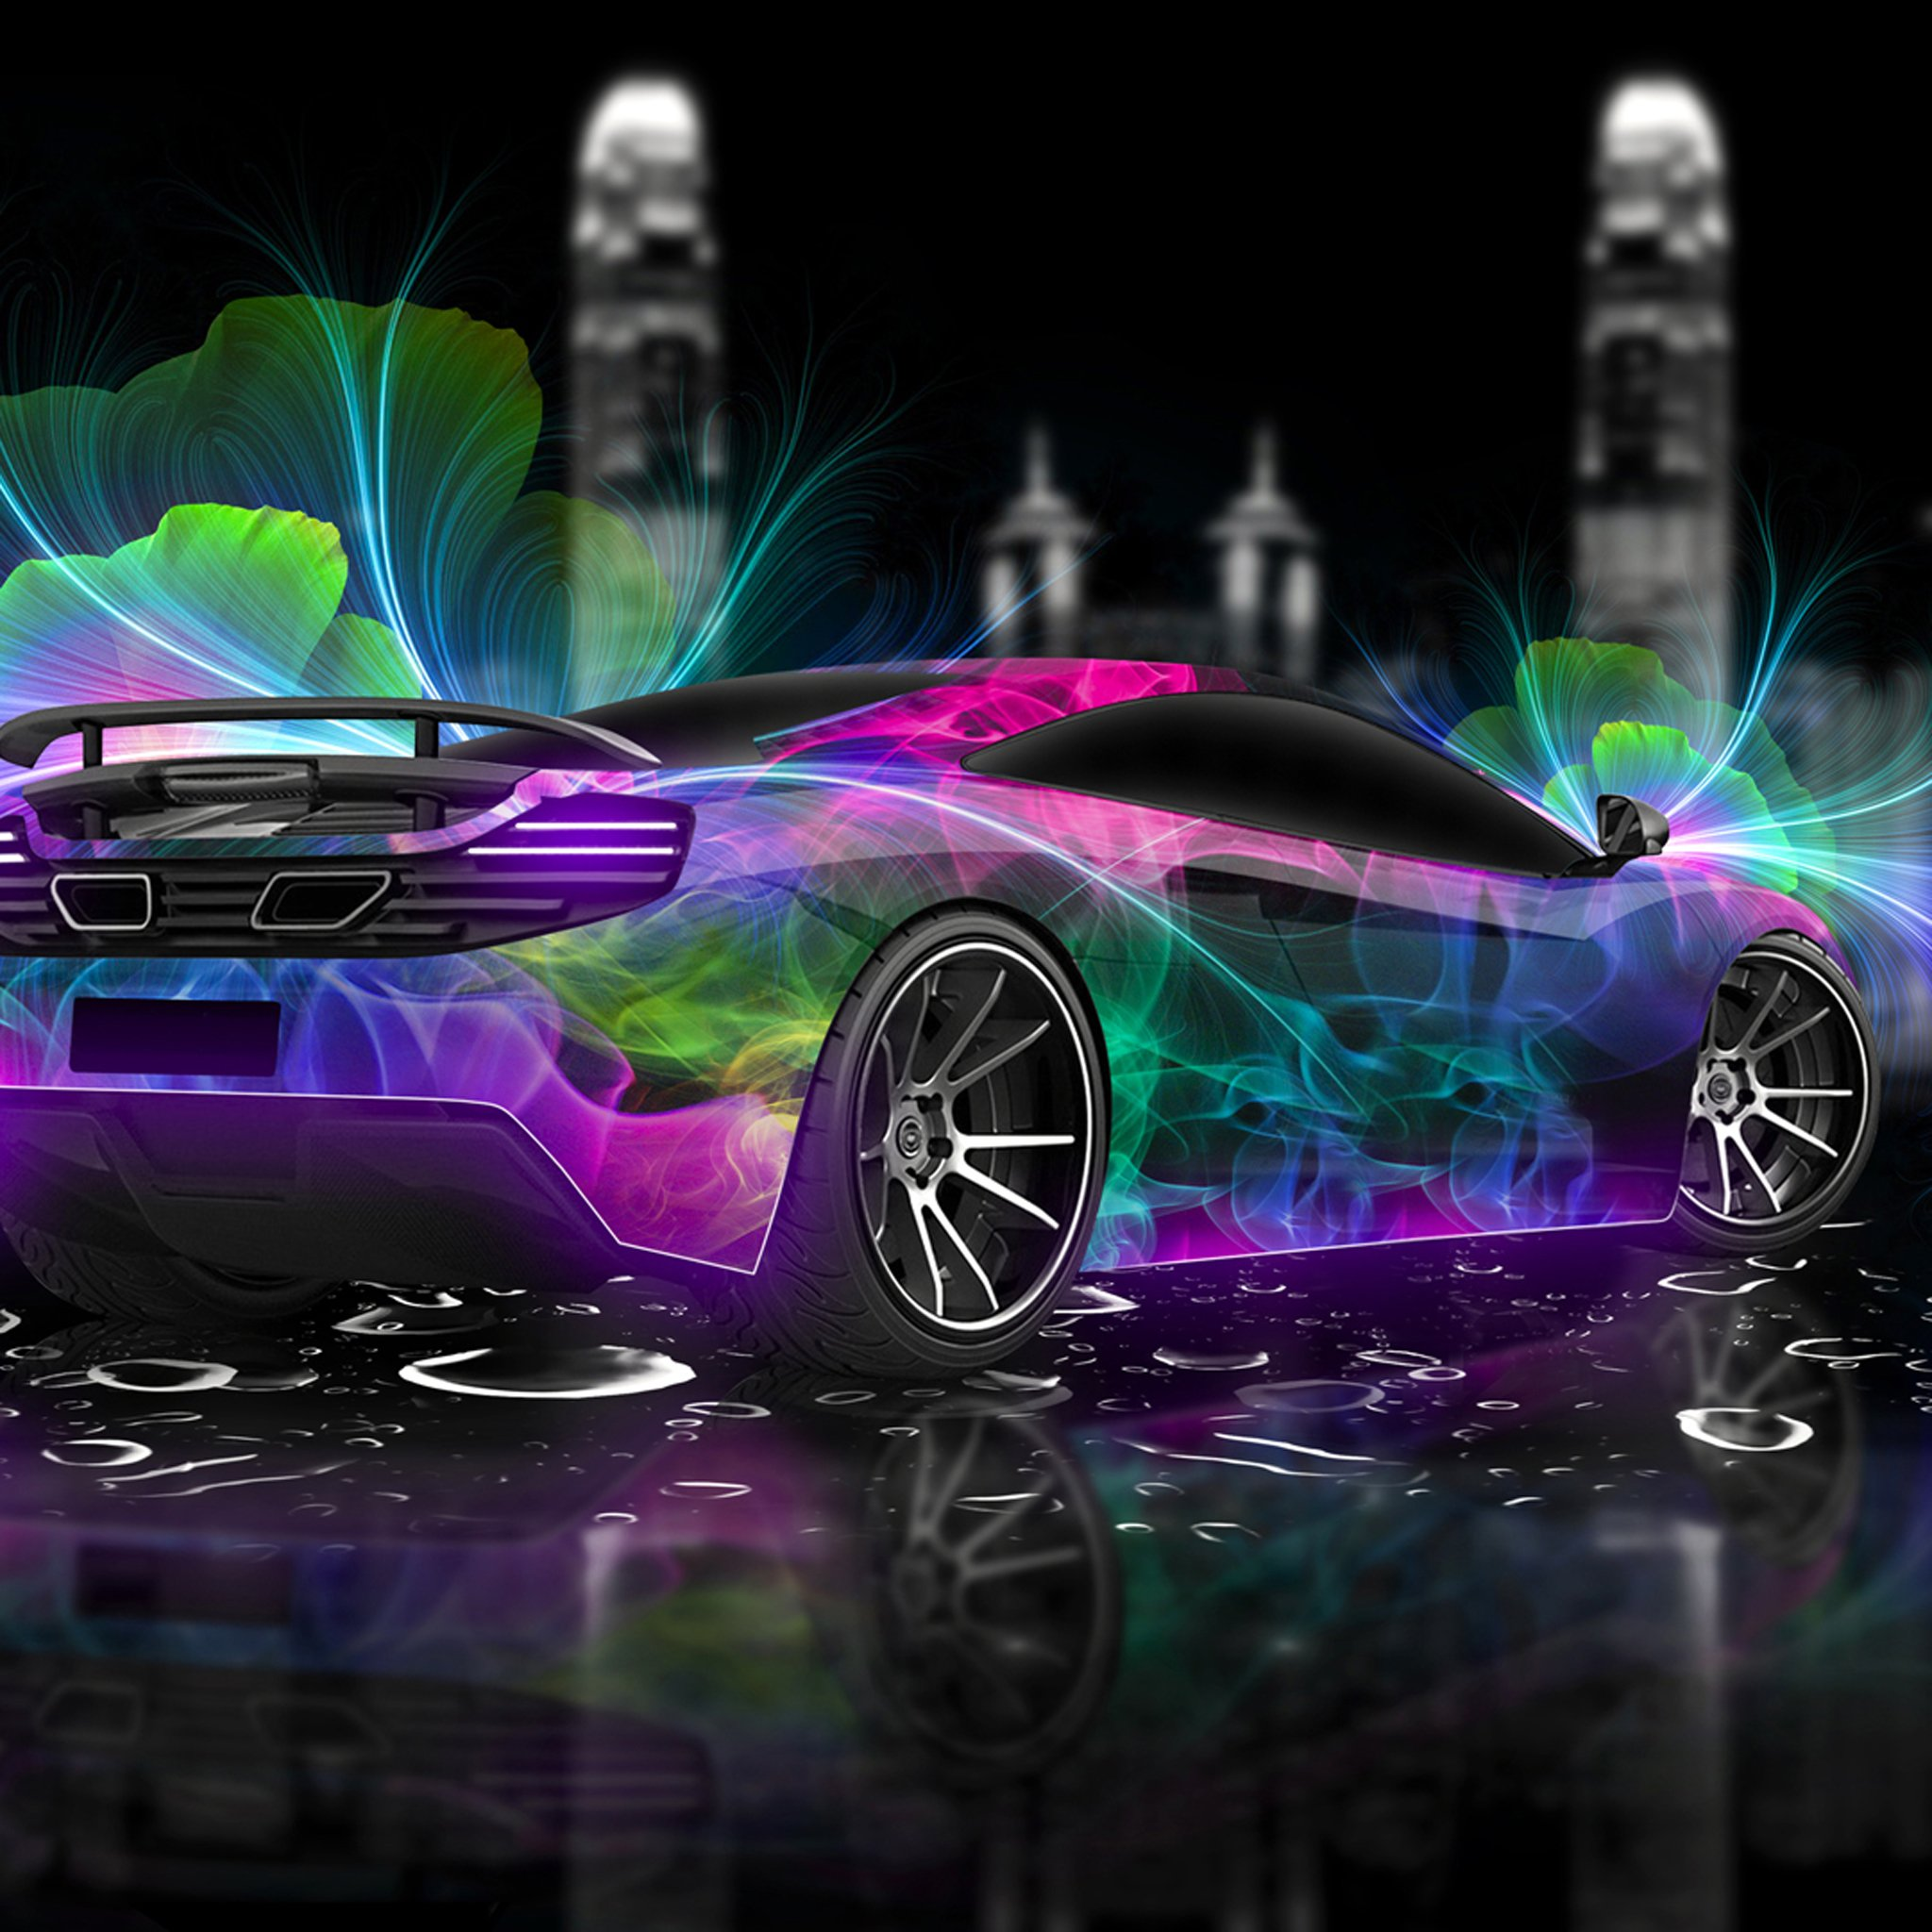 Cars Mclaren - iPad Retina Wallpaper for iPhone 11, Pro ...